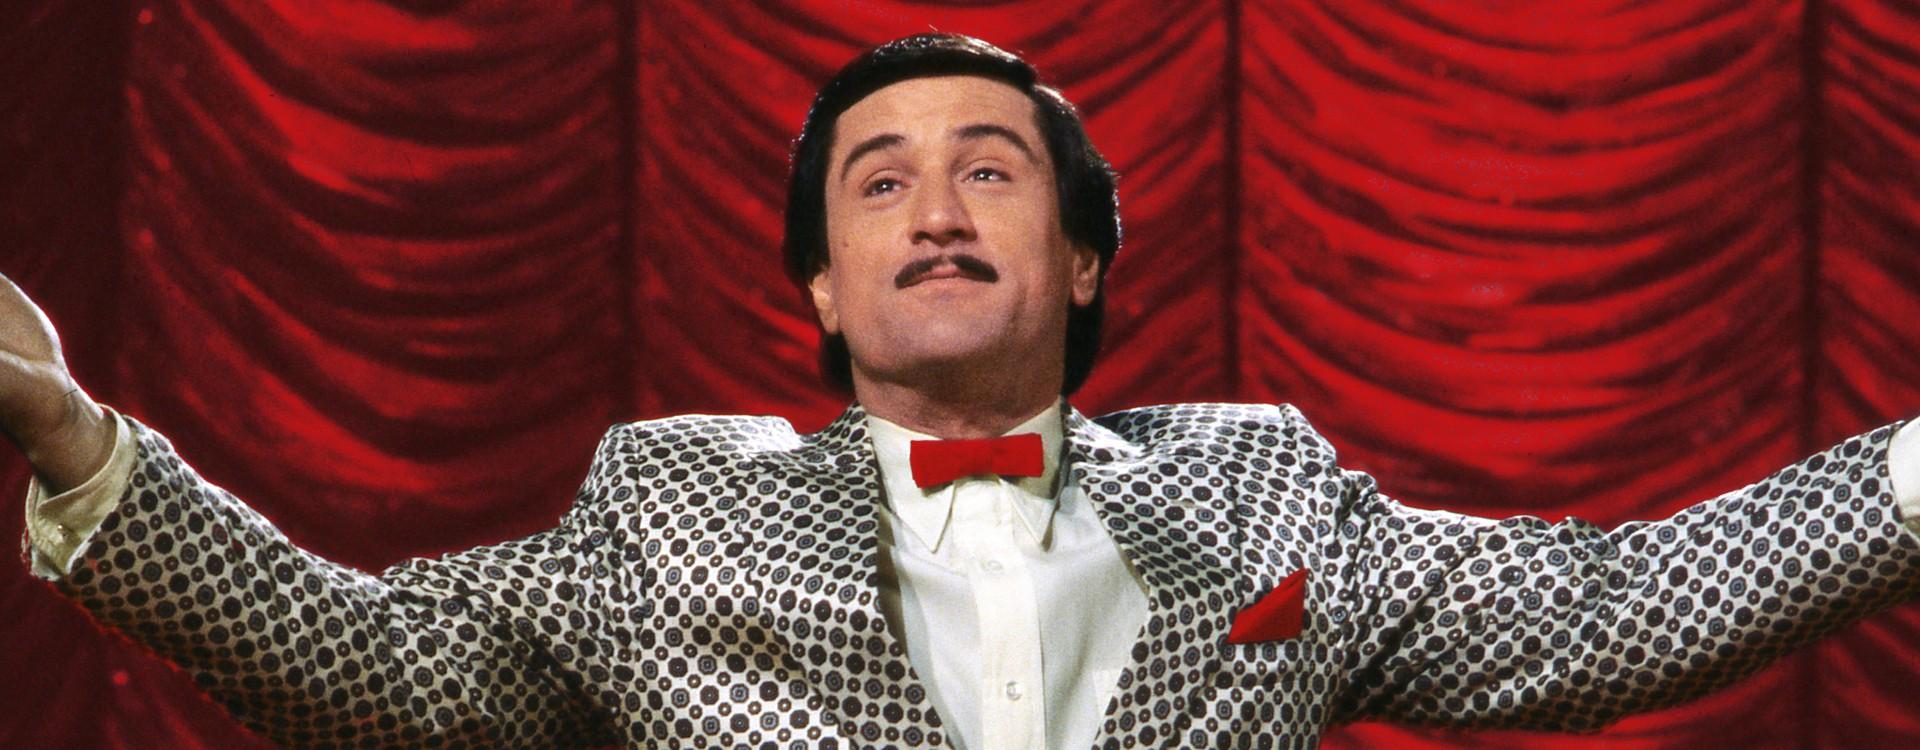 "Blu-ray-Premiere von ""King of Comedy"""